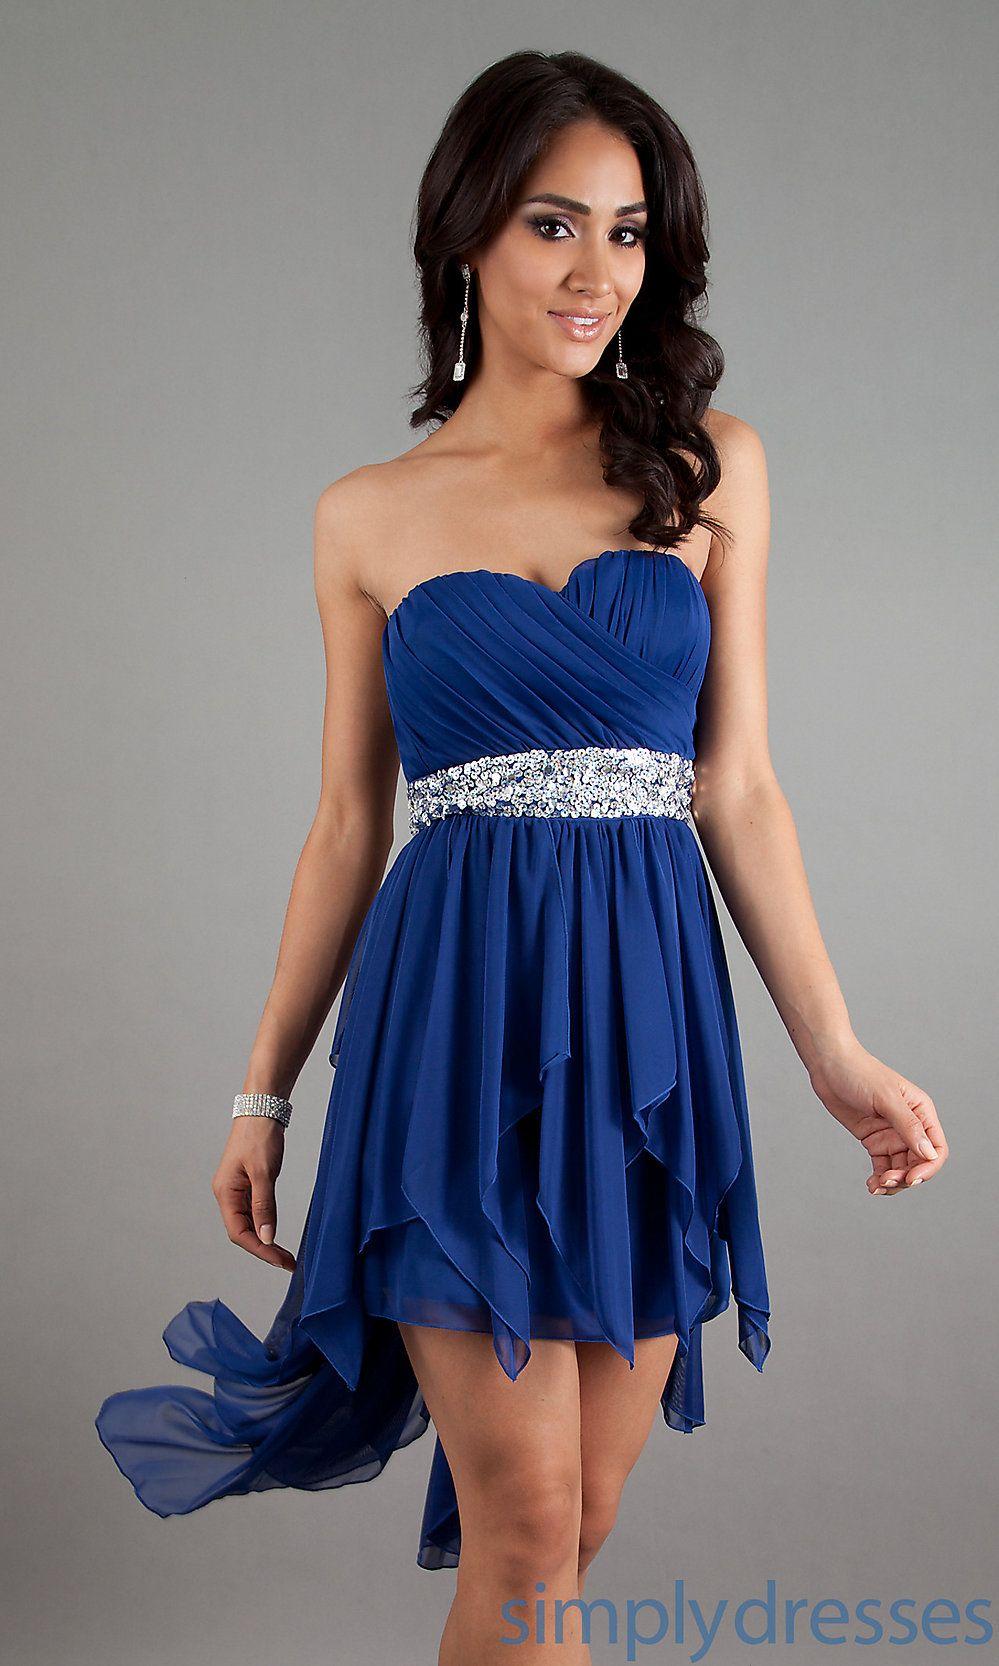 mango prom dress | Mango Dresses, Clothes and Accessories ...